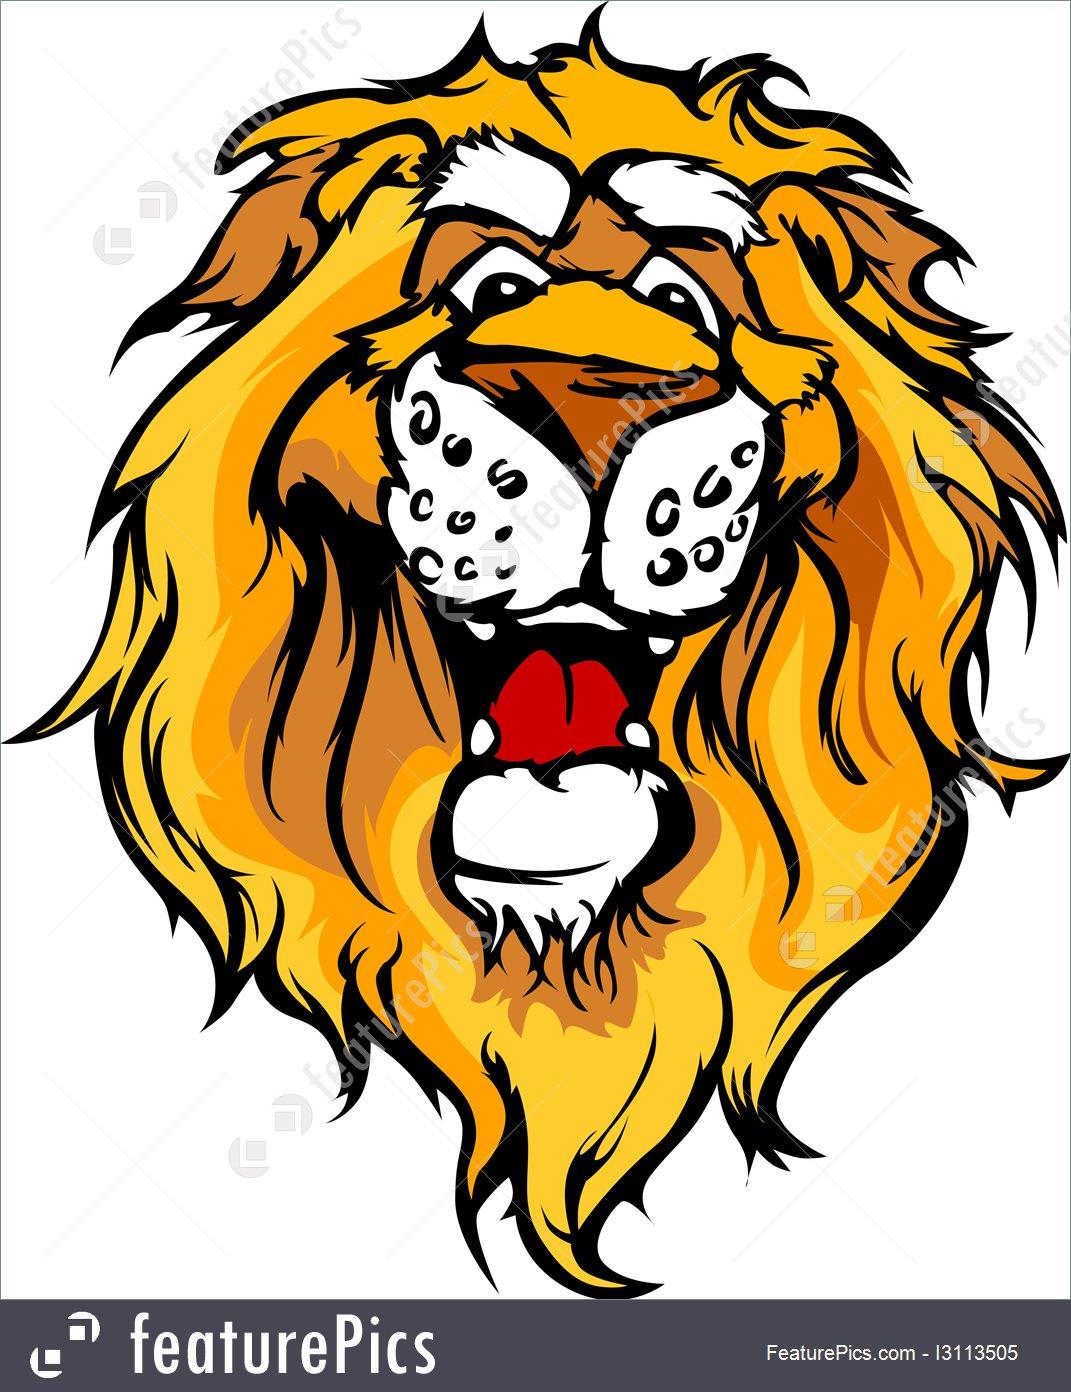 1071x1392 Smiling Cartoon Lion Mascot Vector Graphic